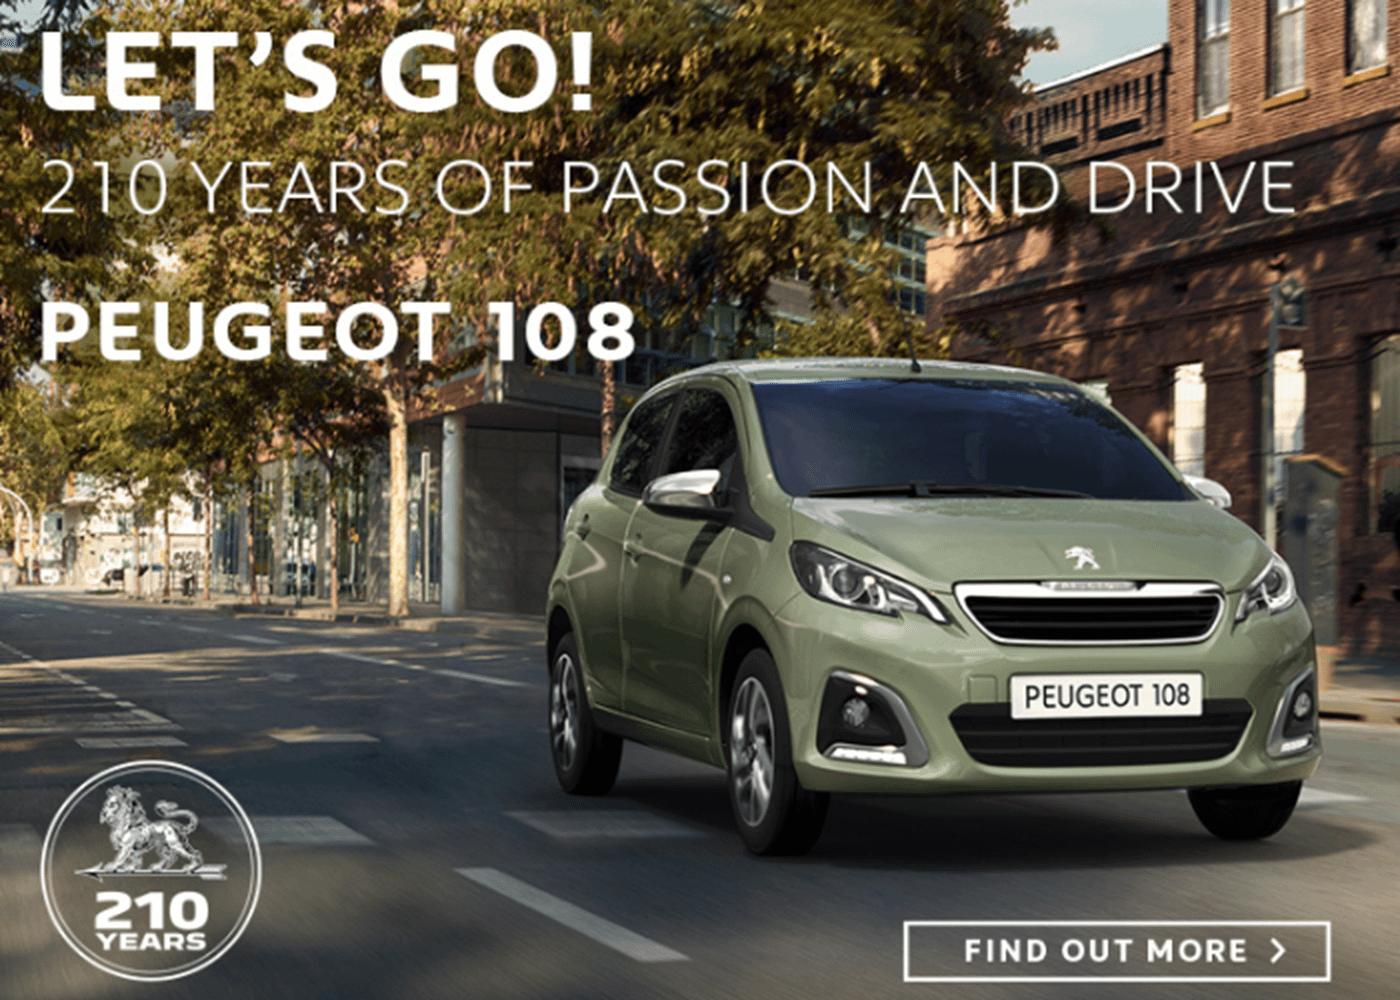 Peugeot 108 at Chippenham Motor Company